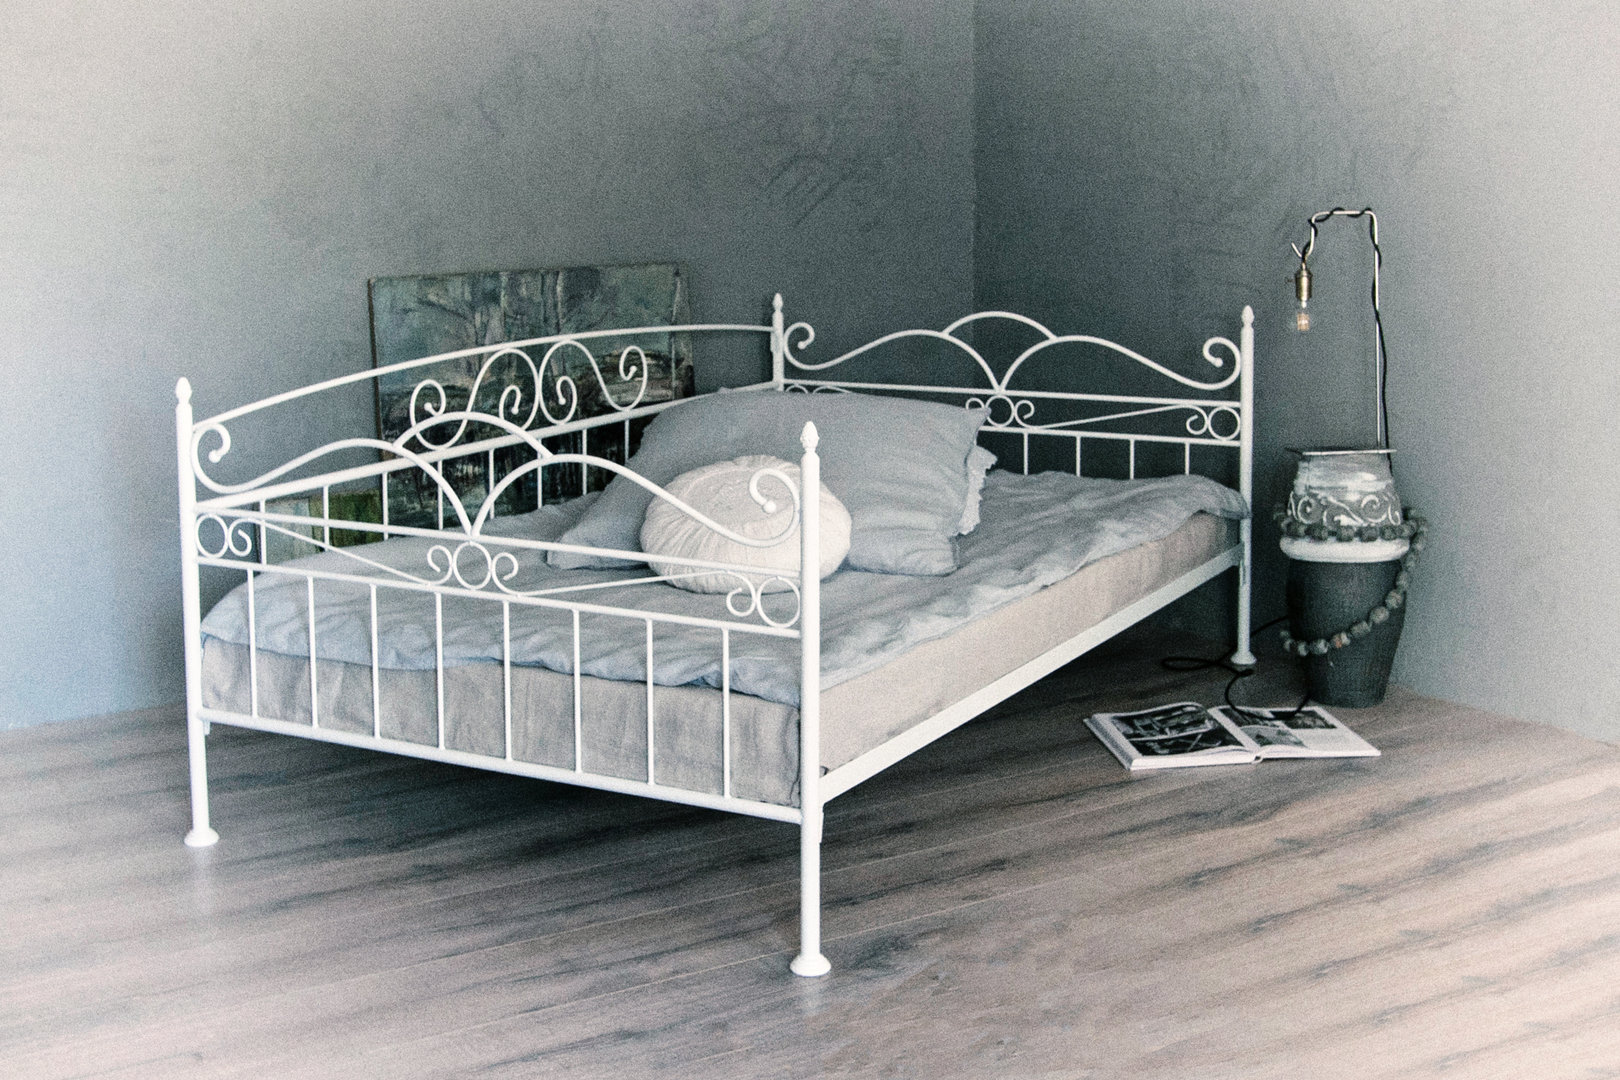 Full Size of Weißes Bett 140x200 Tojo Mit Stauraum 120 X 200 Komforthöhe Betten Düsseldorf 220 Baza Massivholz Weisses Metall Trends 80x200 Ausziehbett 200x200 Bett Bett 120x200